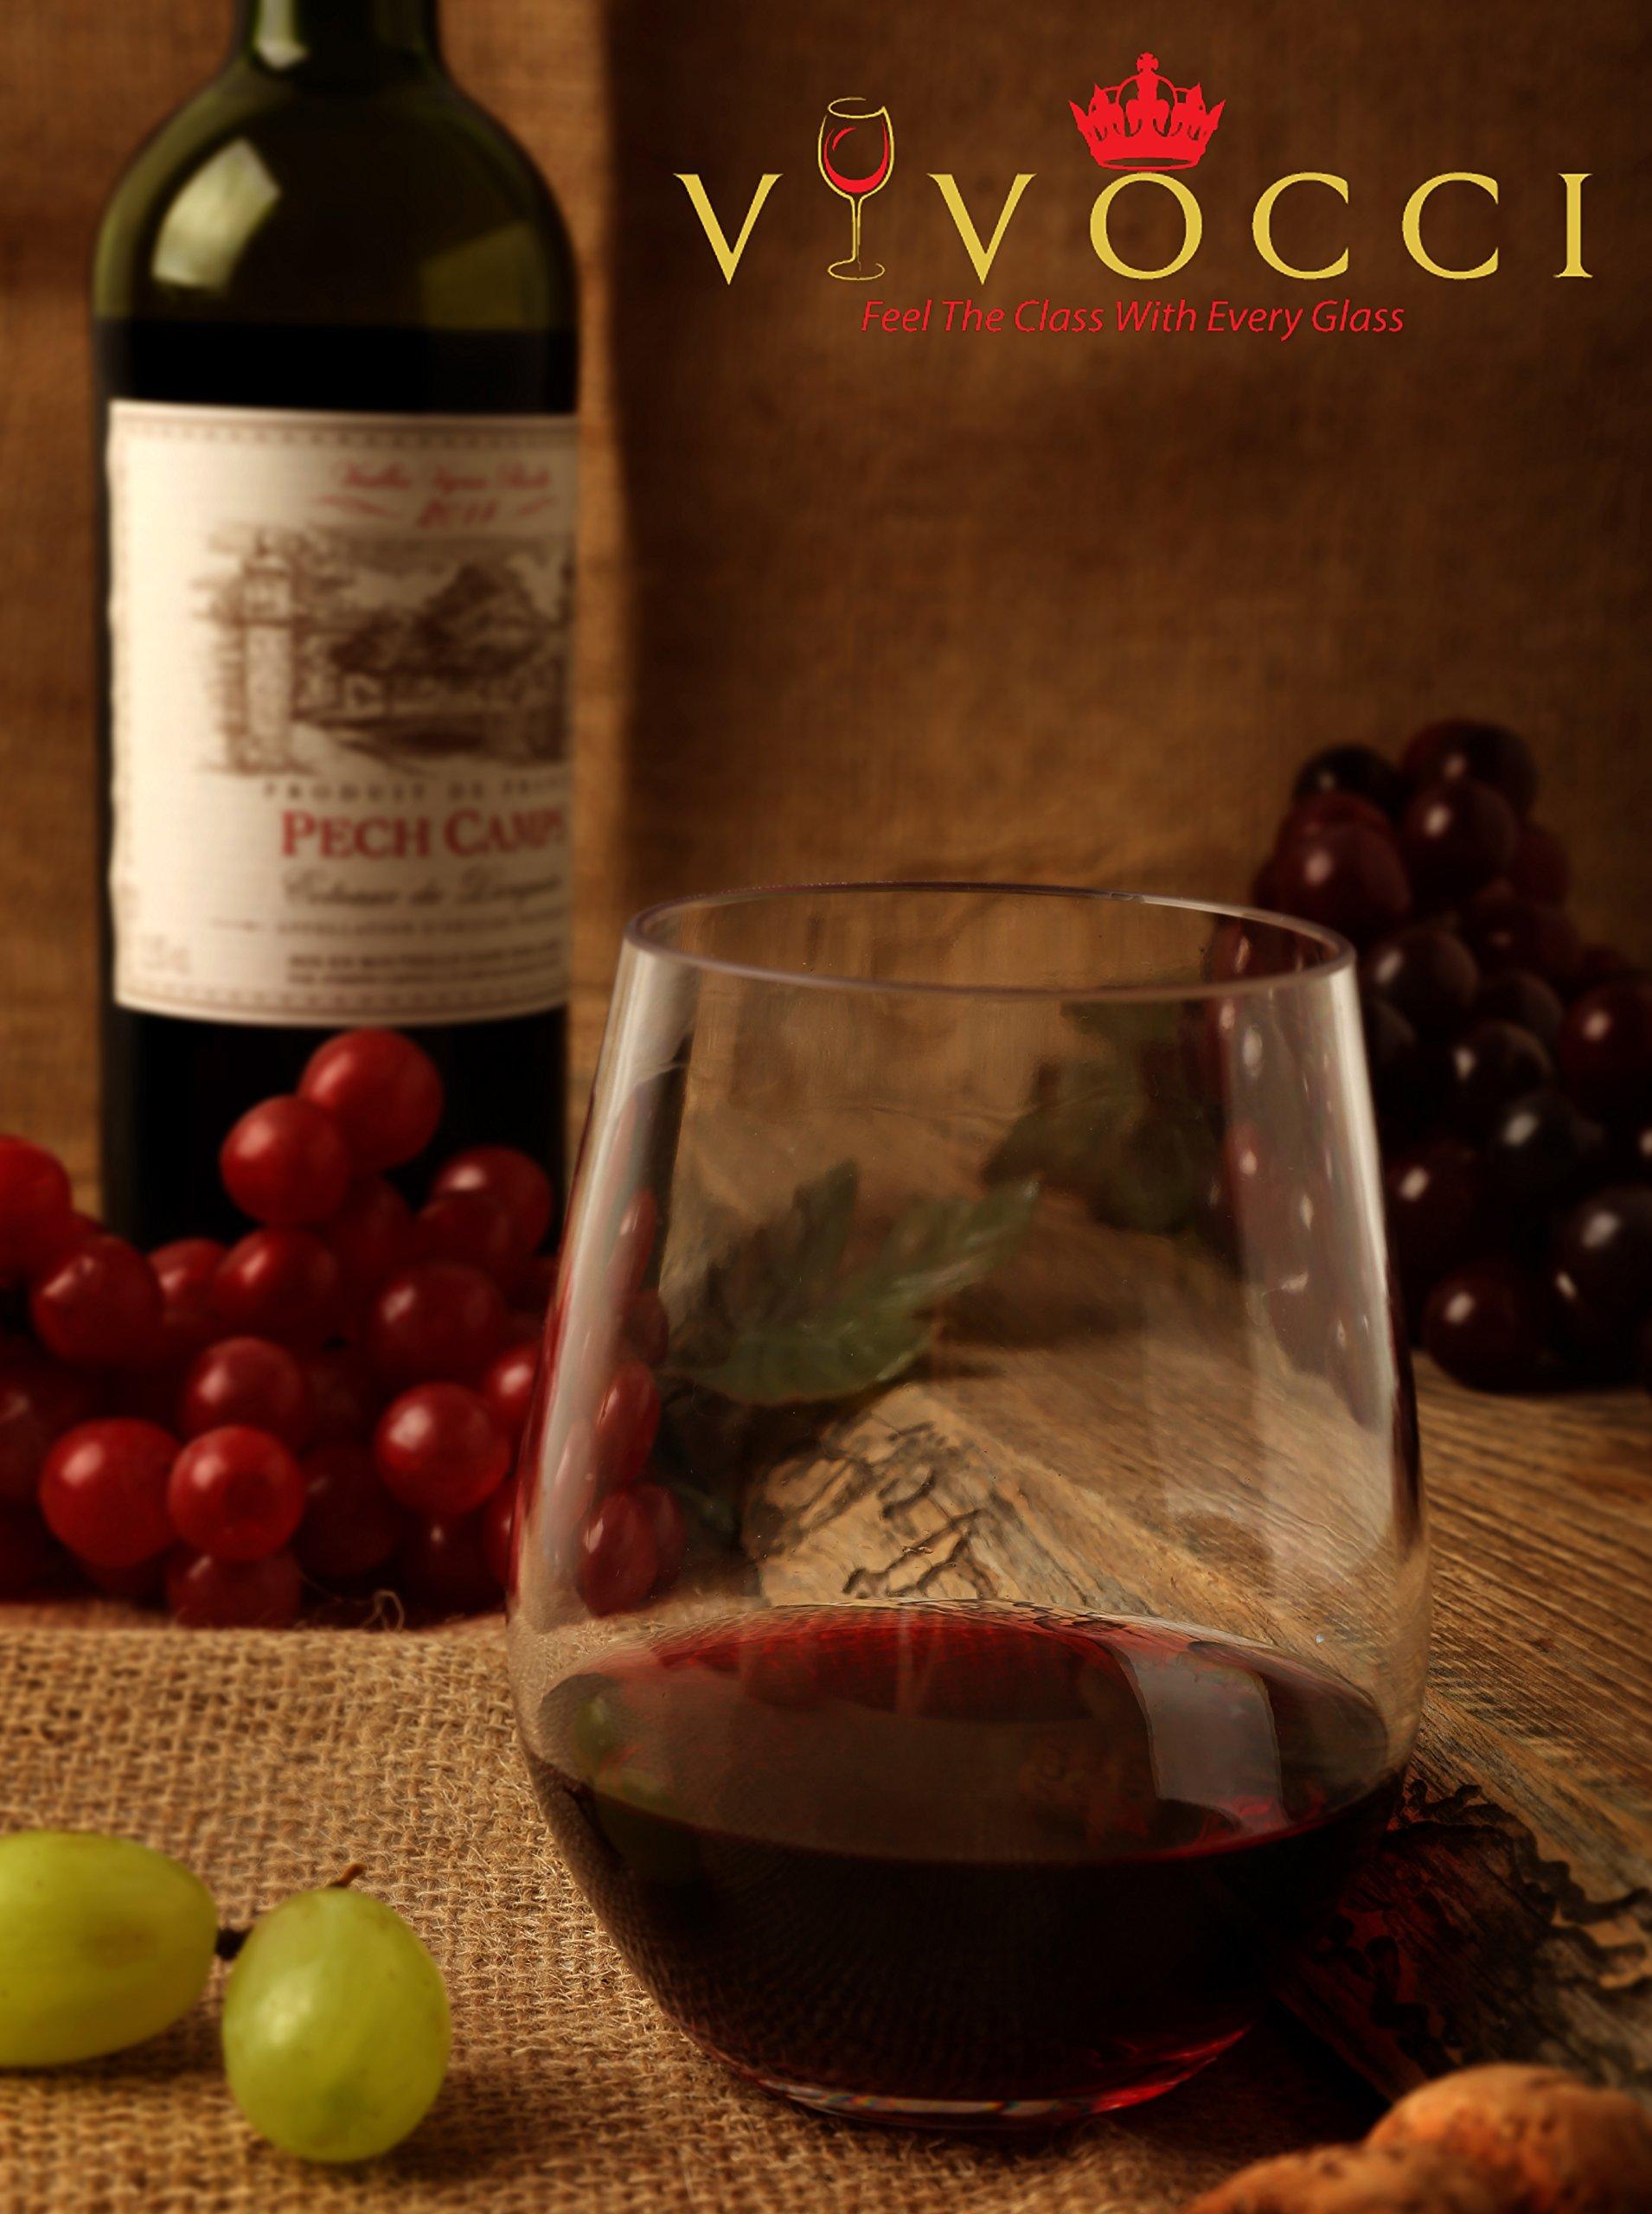 Vivocci Unbreakable Elegant Plastic Stemless Wine Glasses 20 oz | 100% Tritan Heavy Base | Shatterproof Glassware | Ideal For Cocktails & Scotch | Perfect For Homes & Bars | Dishwasher Safe | Set of 2 by Vivocci (Image #7)